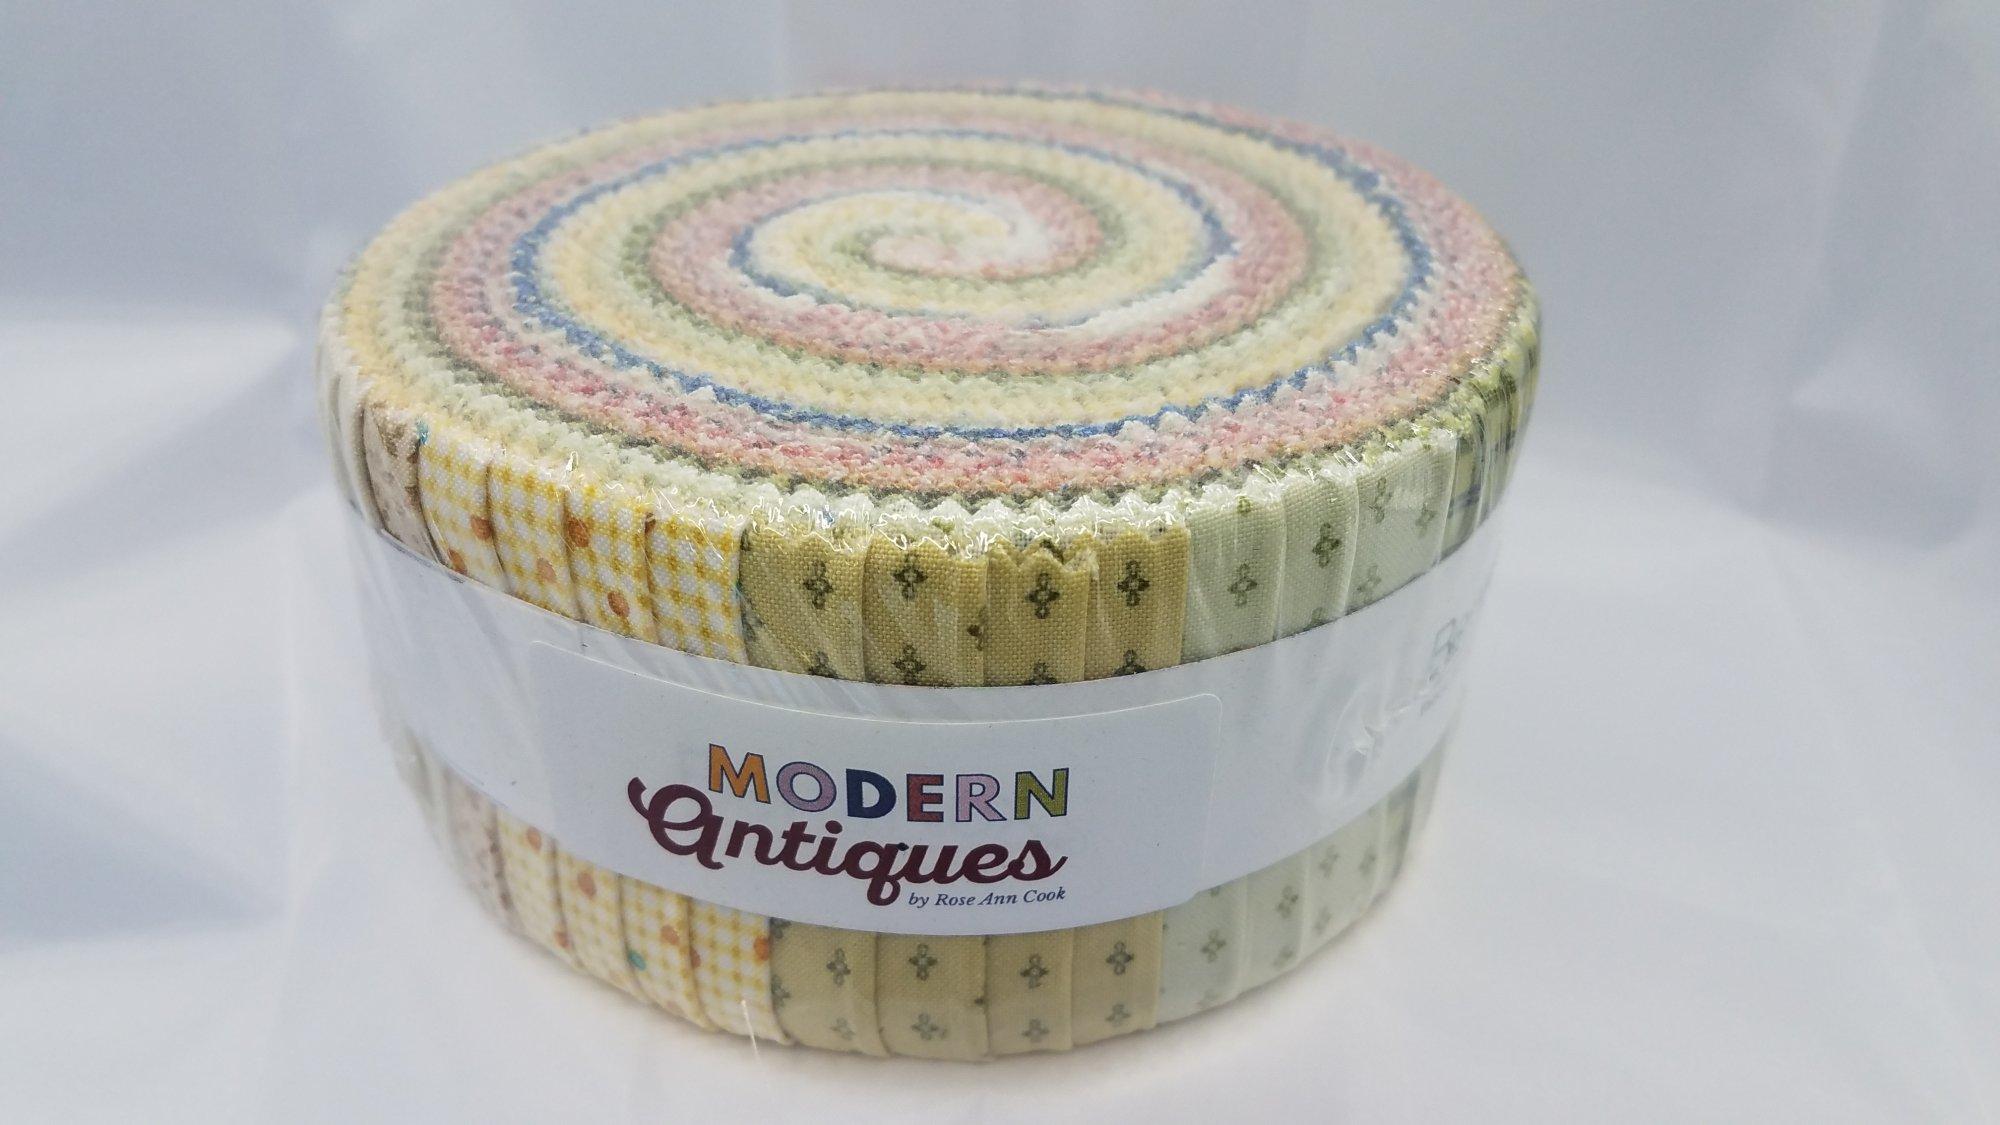 Modern Antiques 5x5 Pack